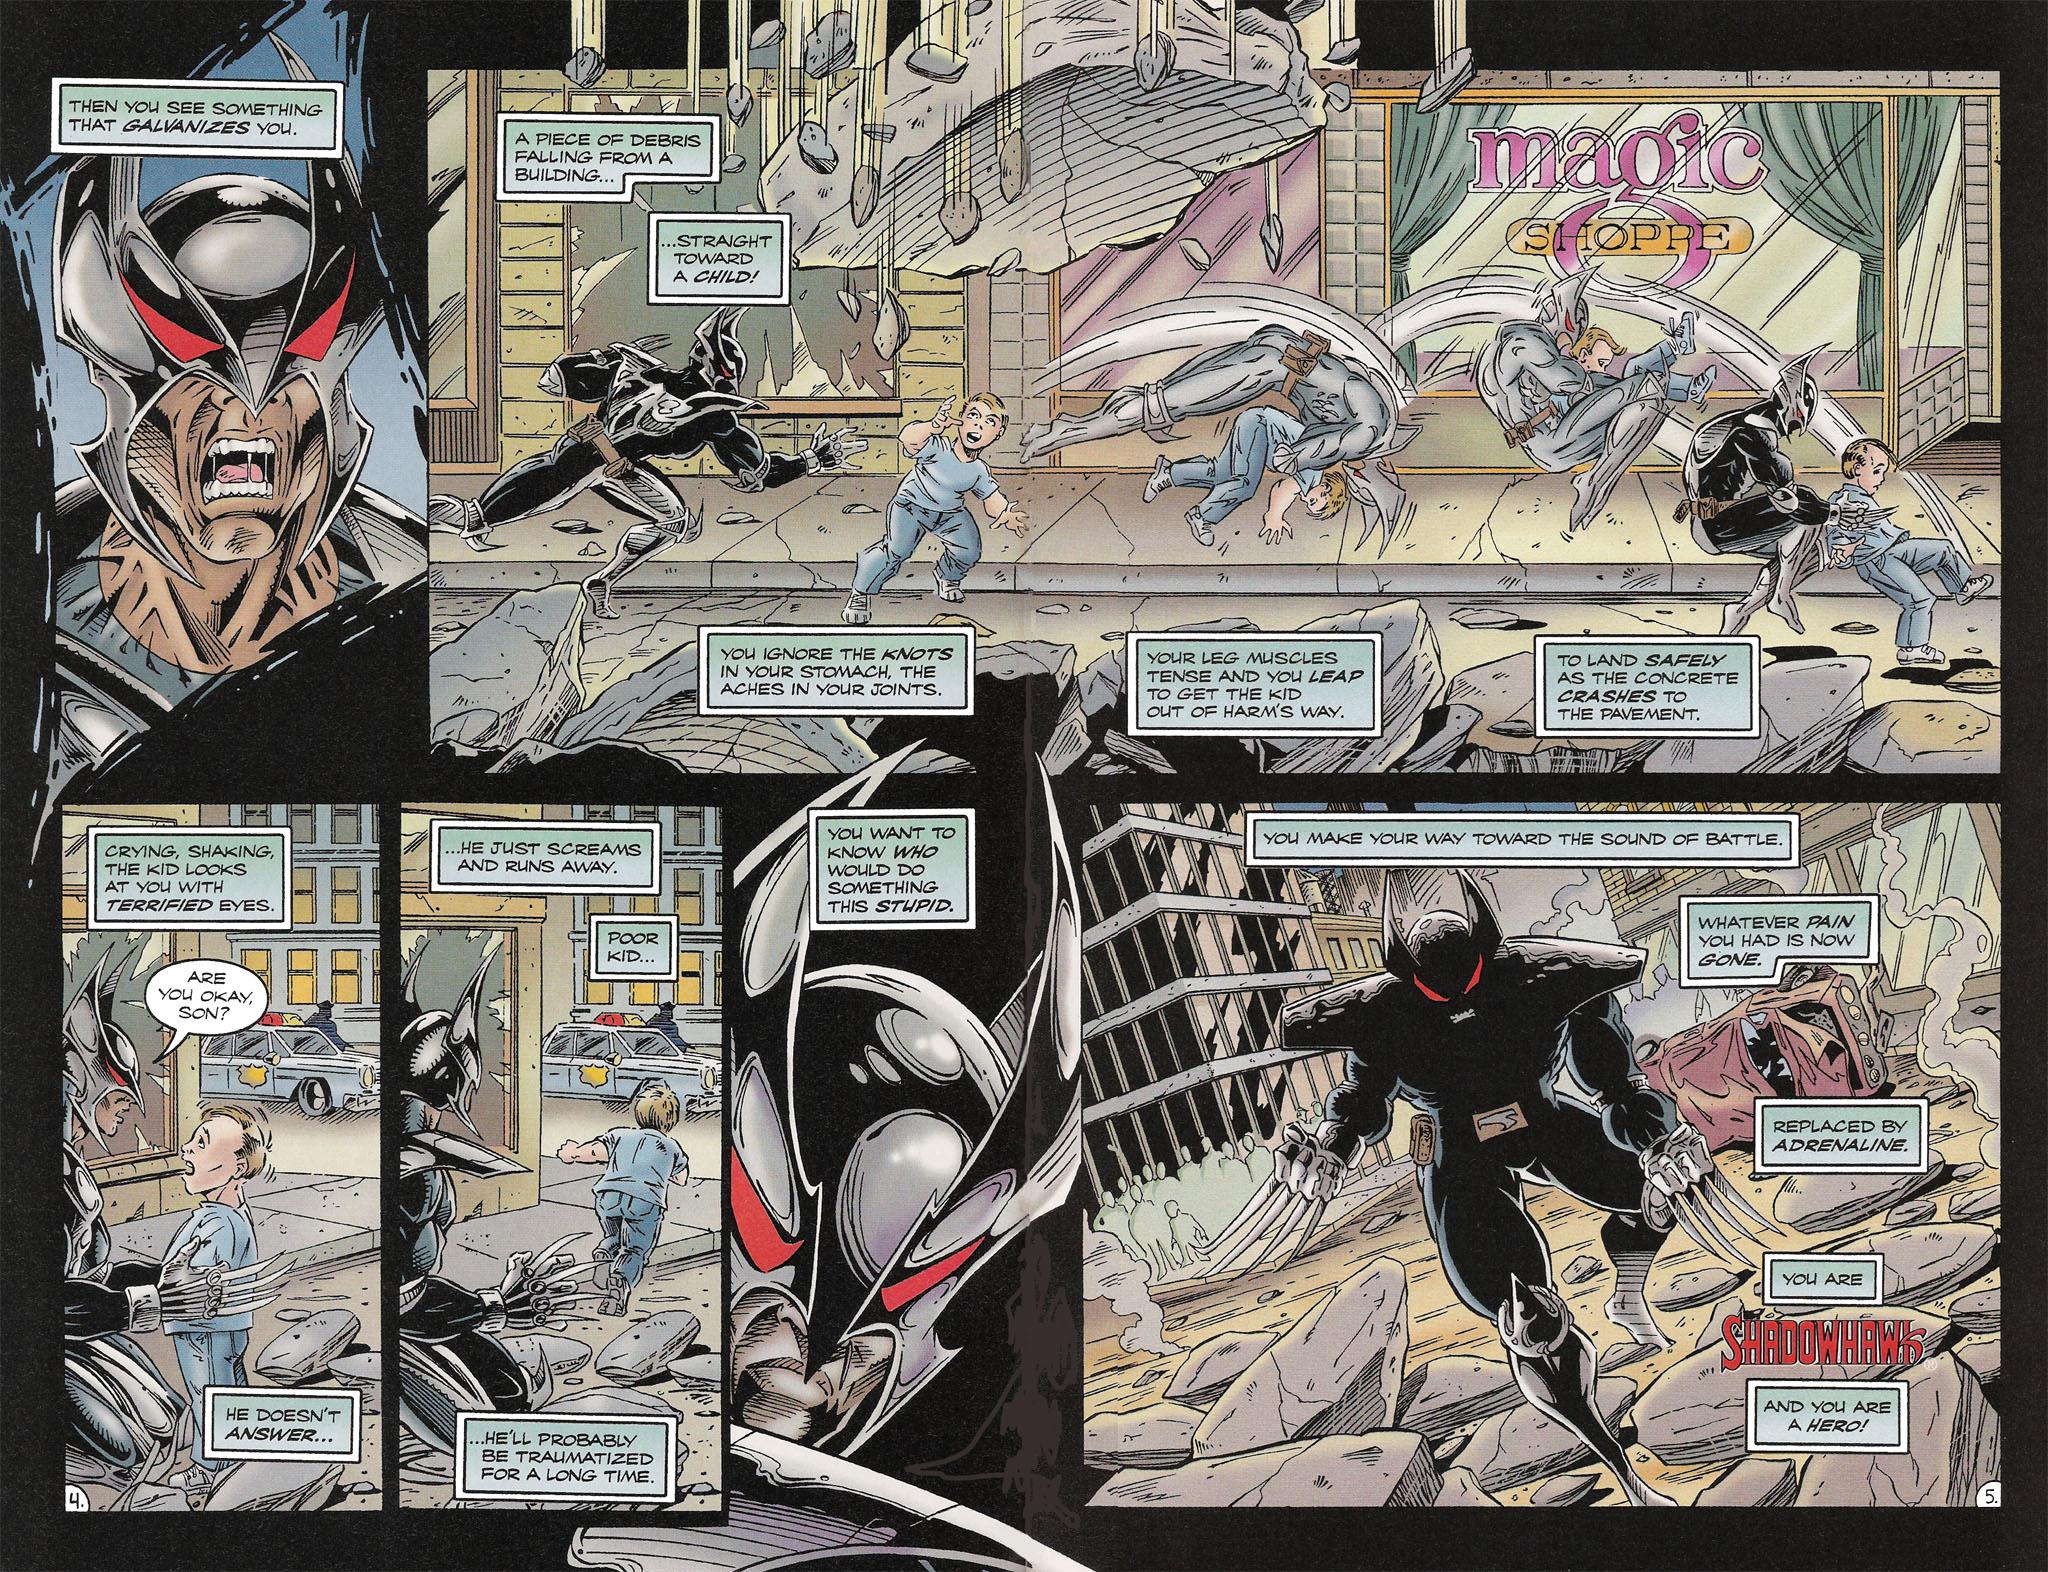 Read online ShadowHawk comic -  Issue #16 - 5